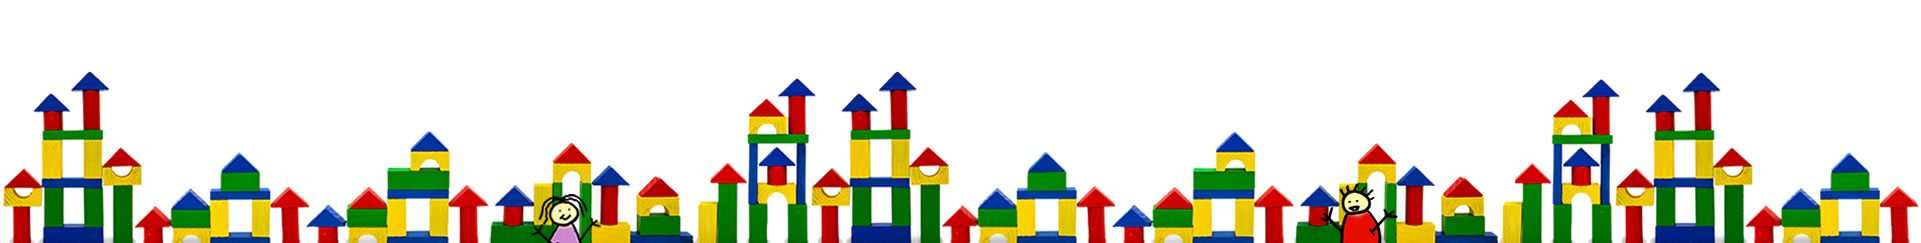 Happy Days Childcare Nursery Grow with Us Childcare Development